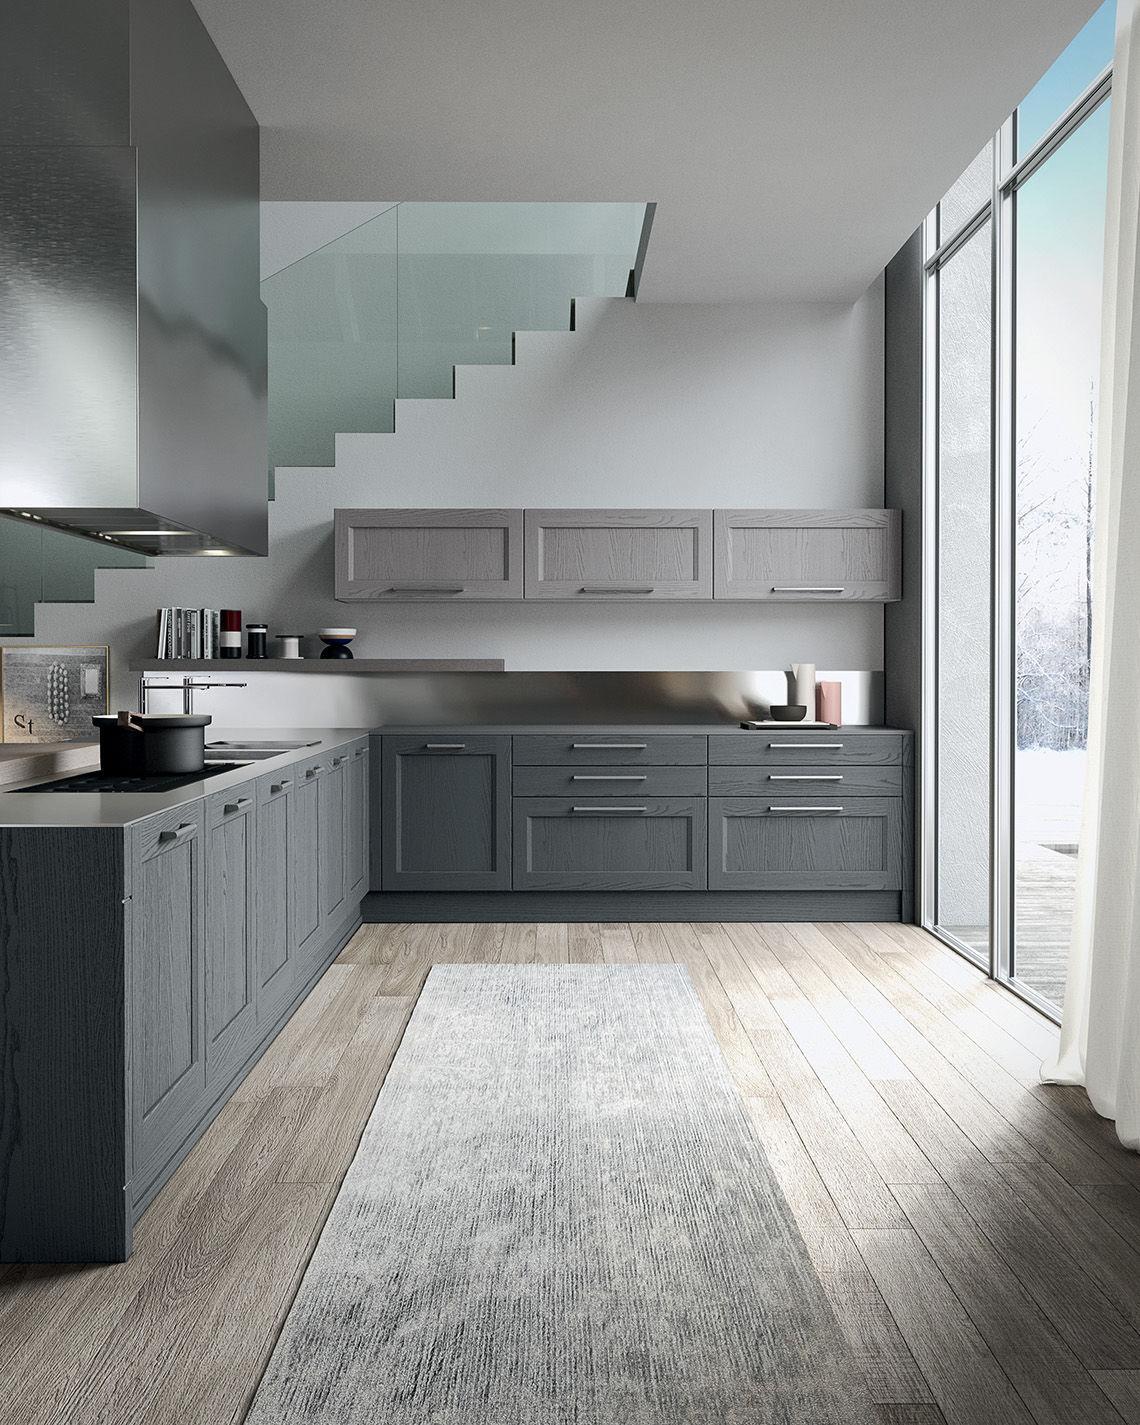 Traditional kitchen / wood veneer / island - VILLAGE 1 - Arrital